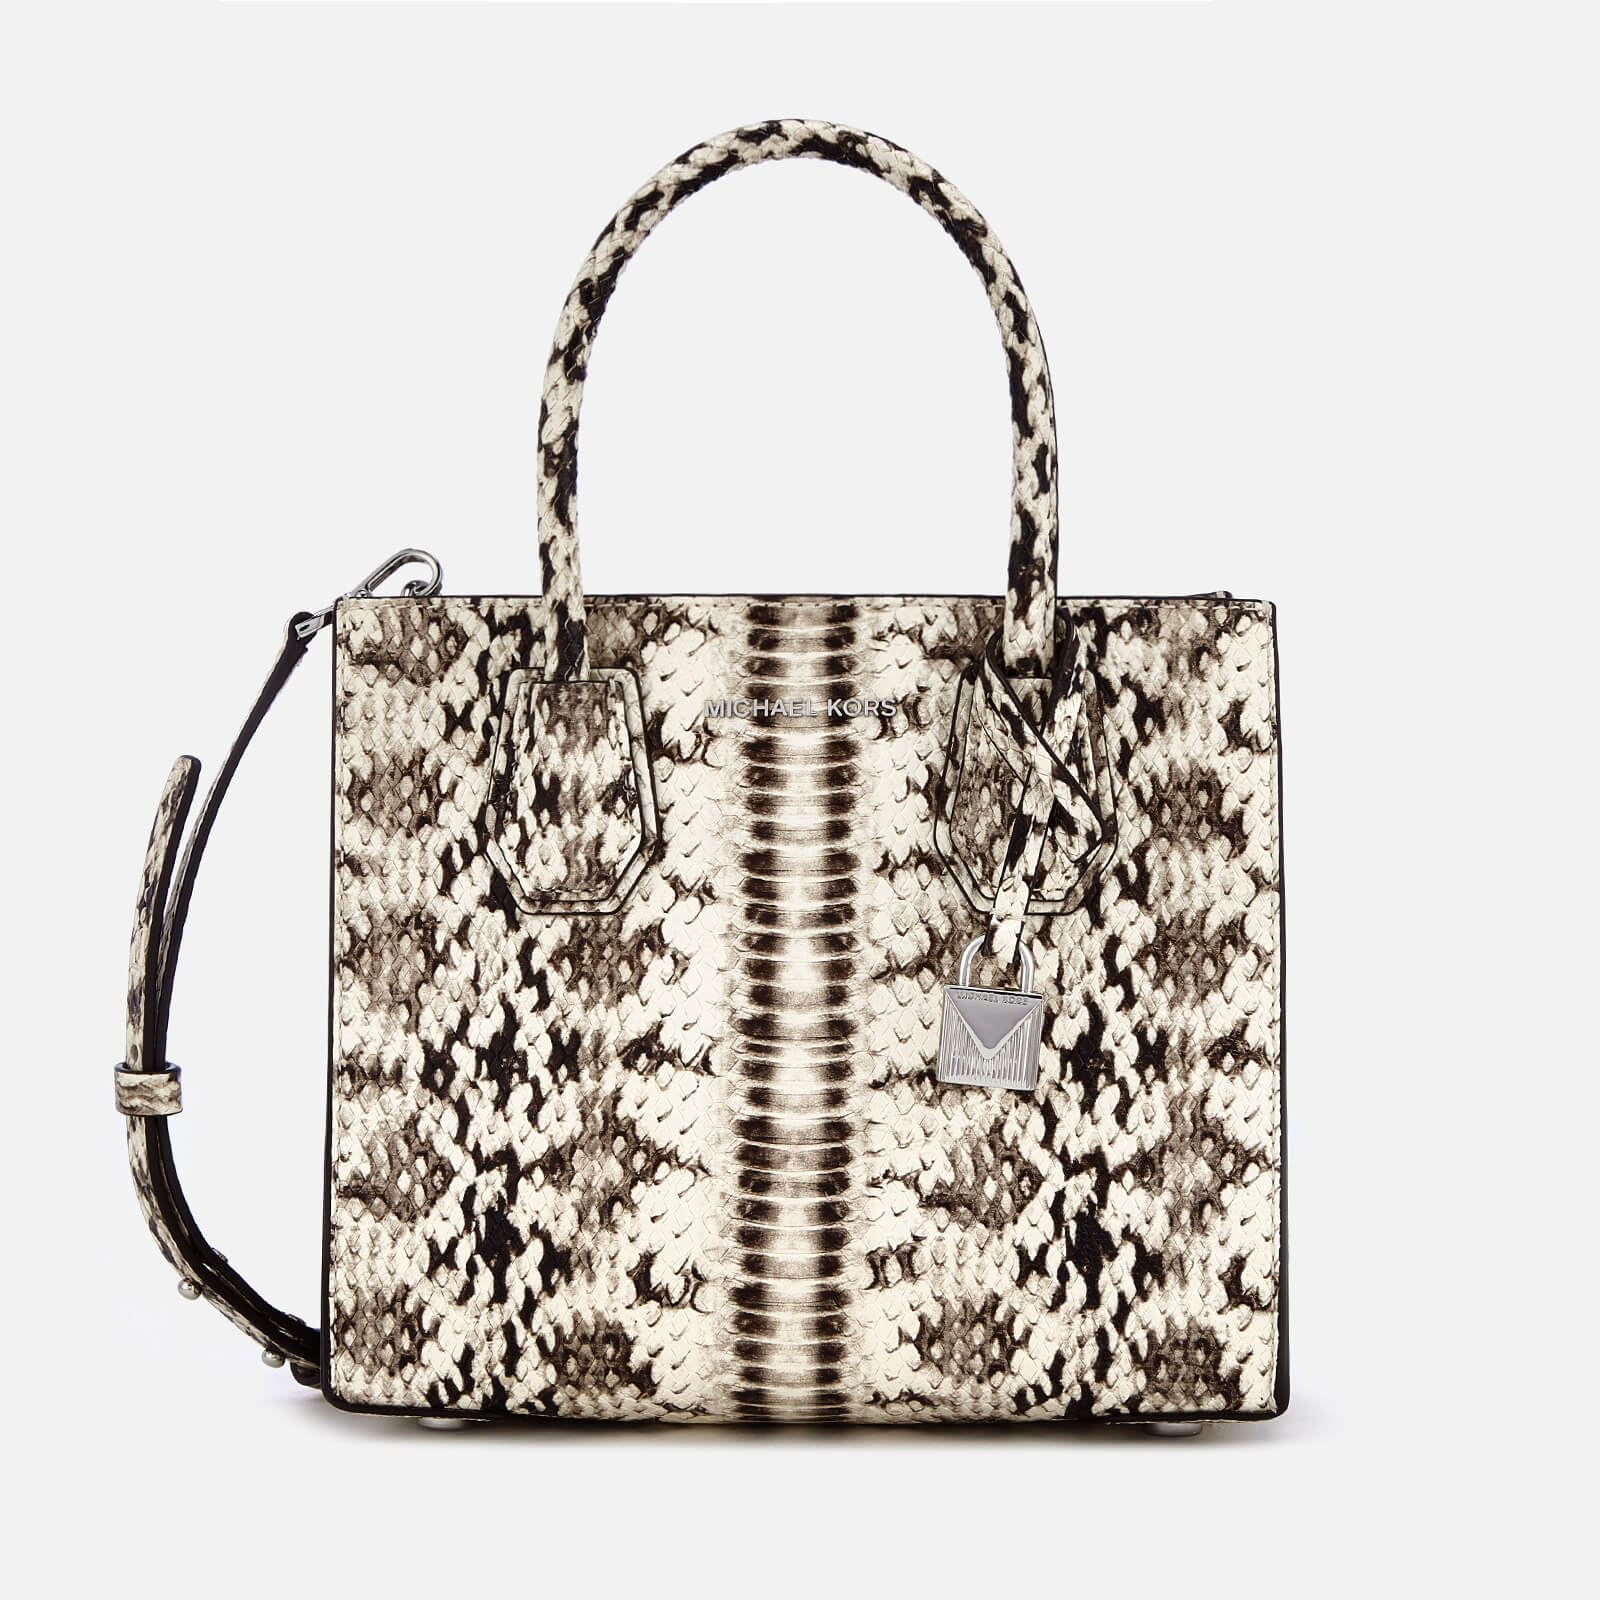 884d00b76573 MICHAEL MICHAEL KORS Women s Mercer Medium Tote Bag - Natural - Free UK  Delivery over £50